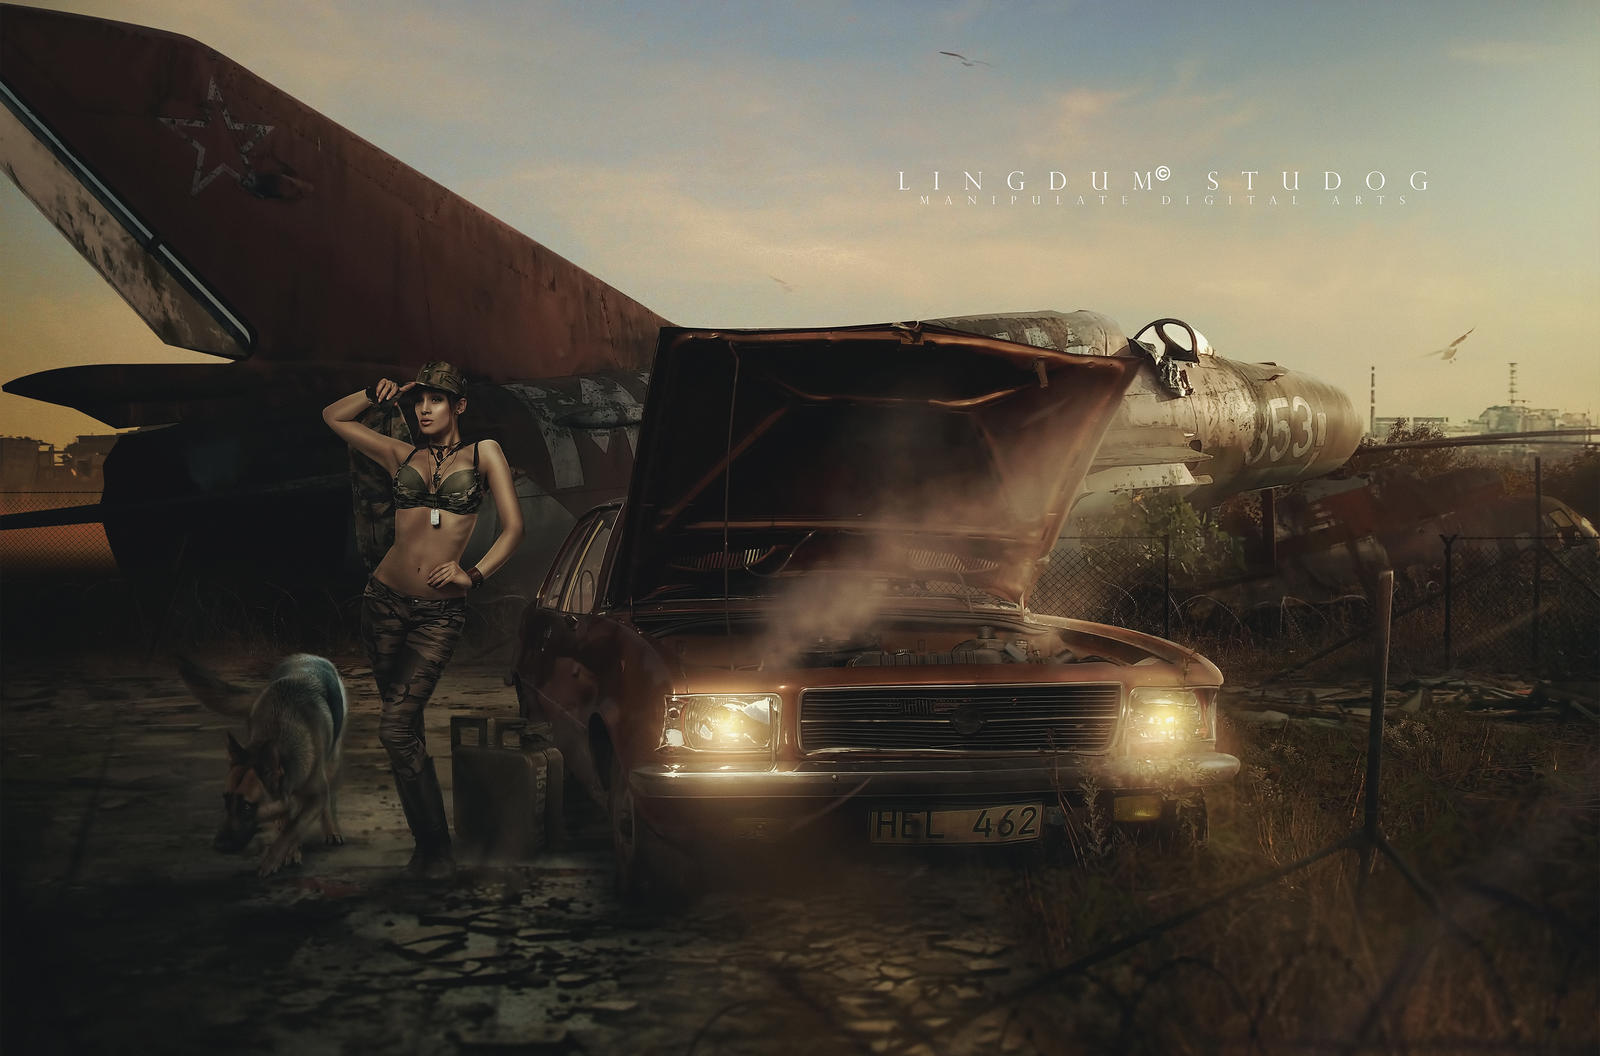 Radiator by LINGDUMSTUDOG